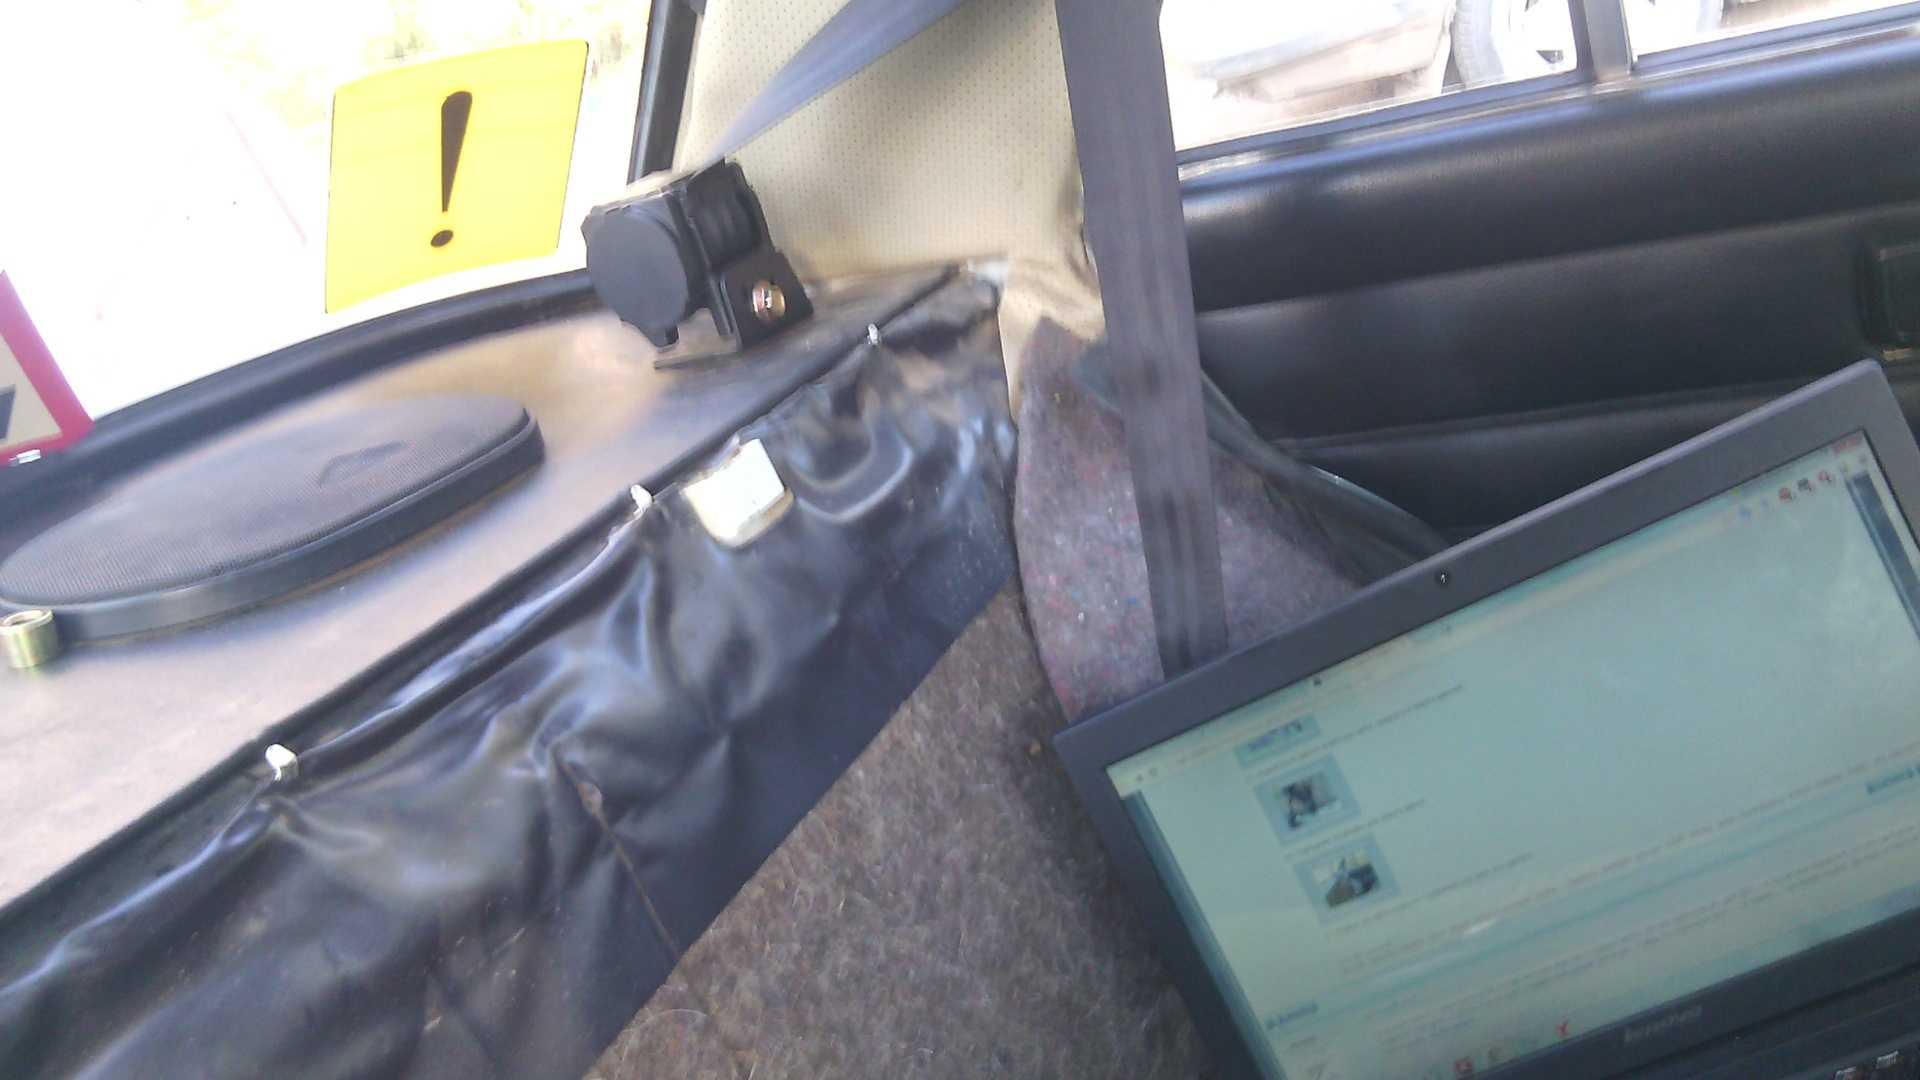 установка ремней безопасности на ваз 2106 - пульс74.рф